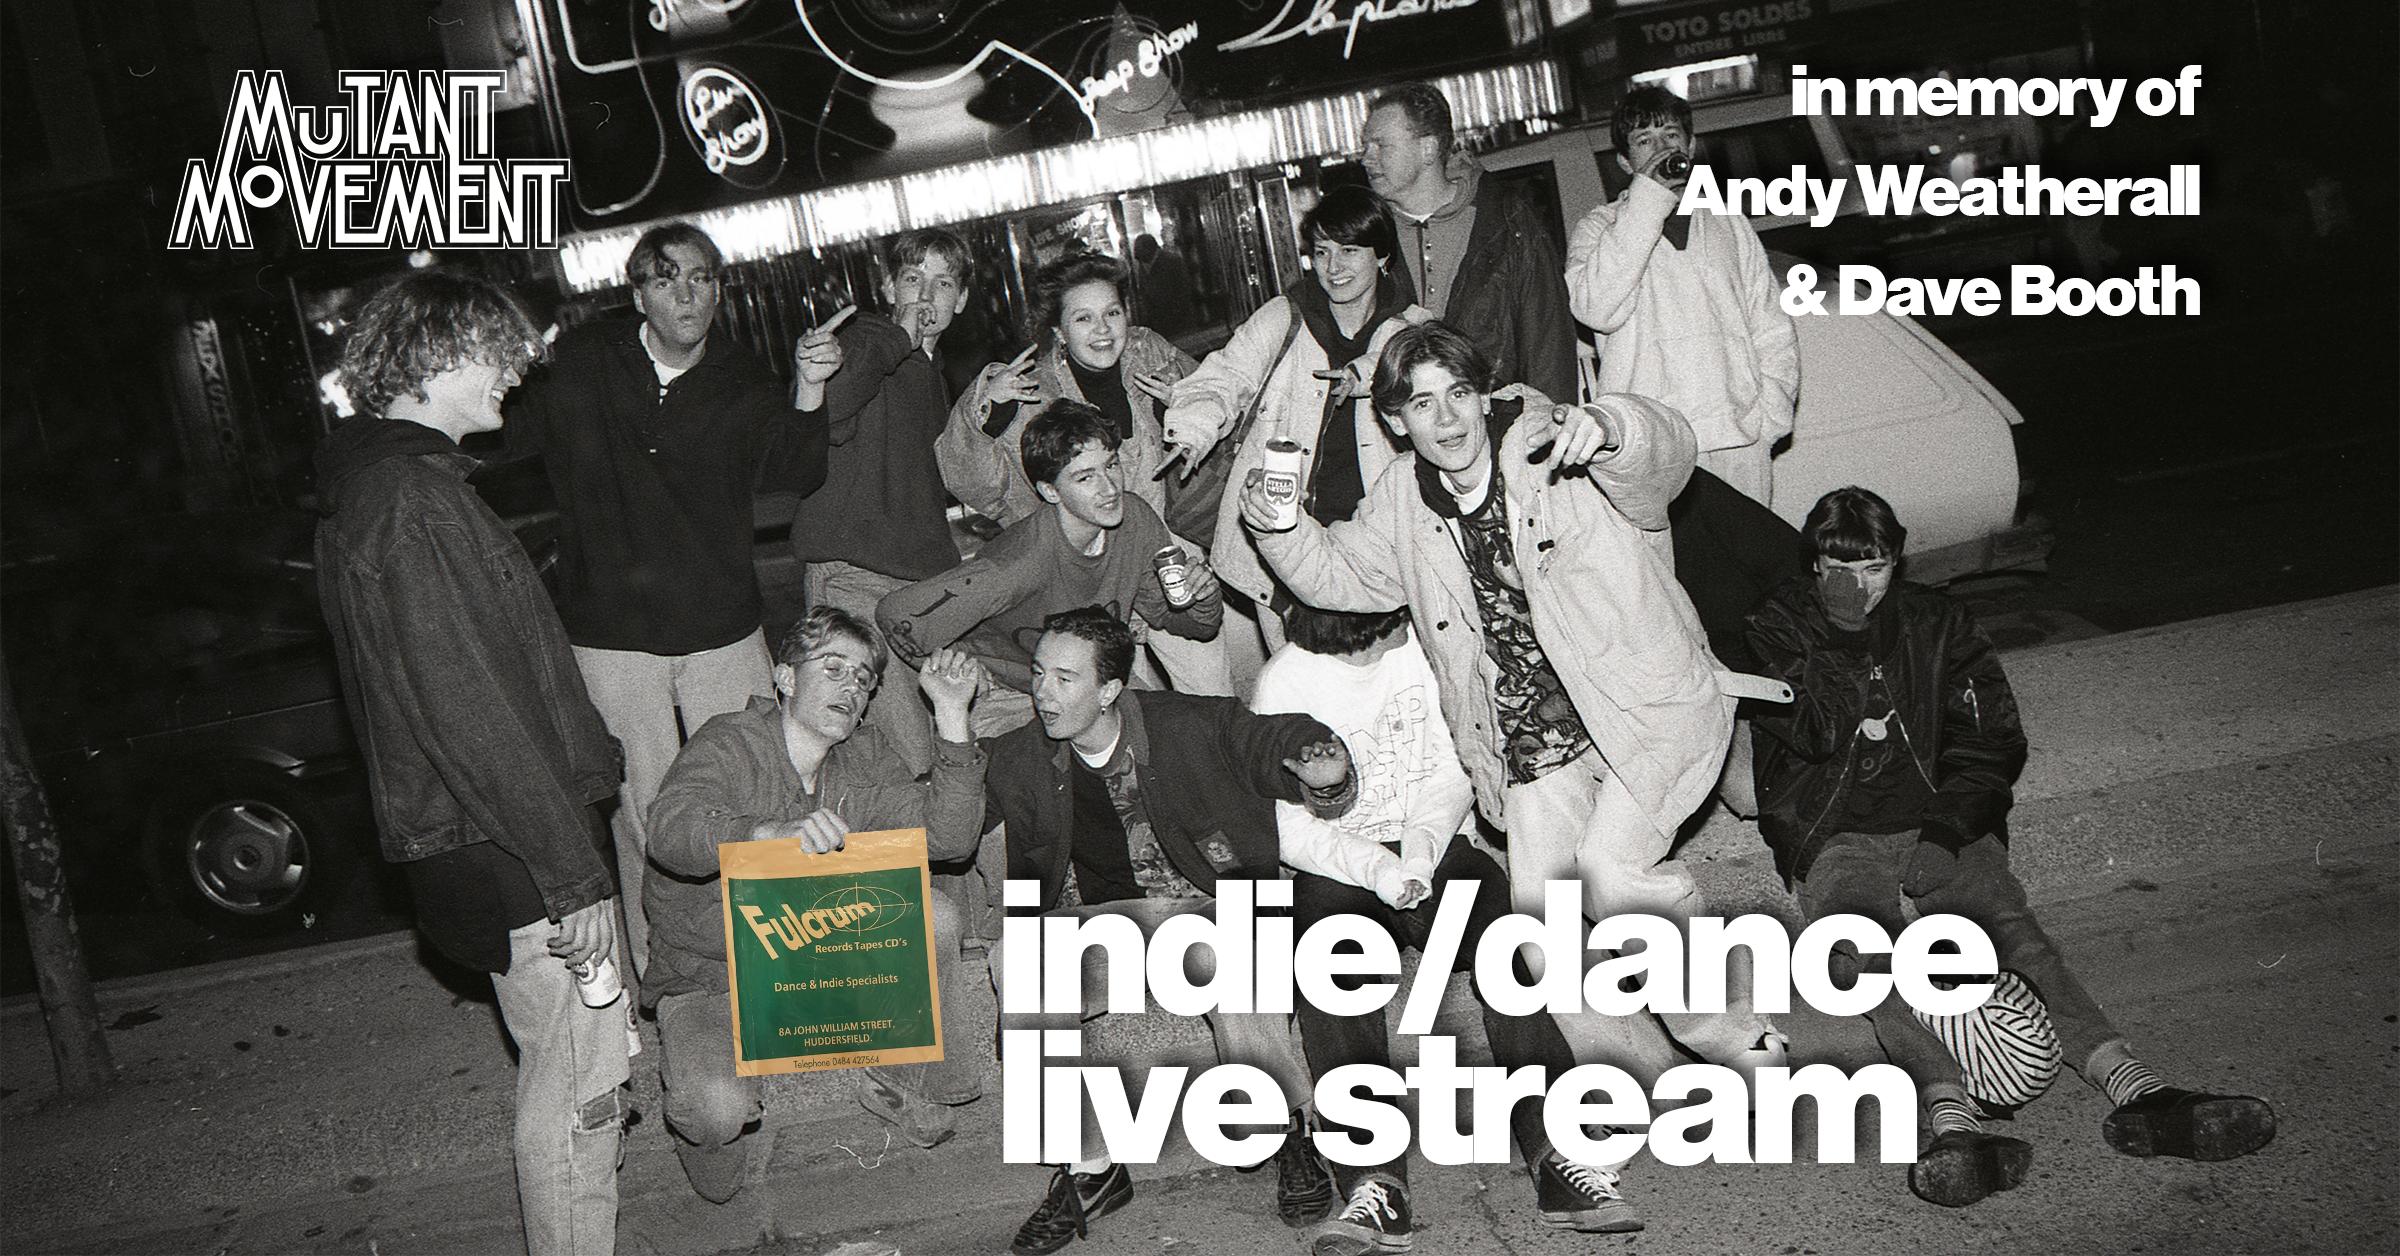 indie/dance live stream by DJ Mutant Movement/Fulcrum Records